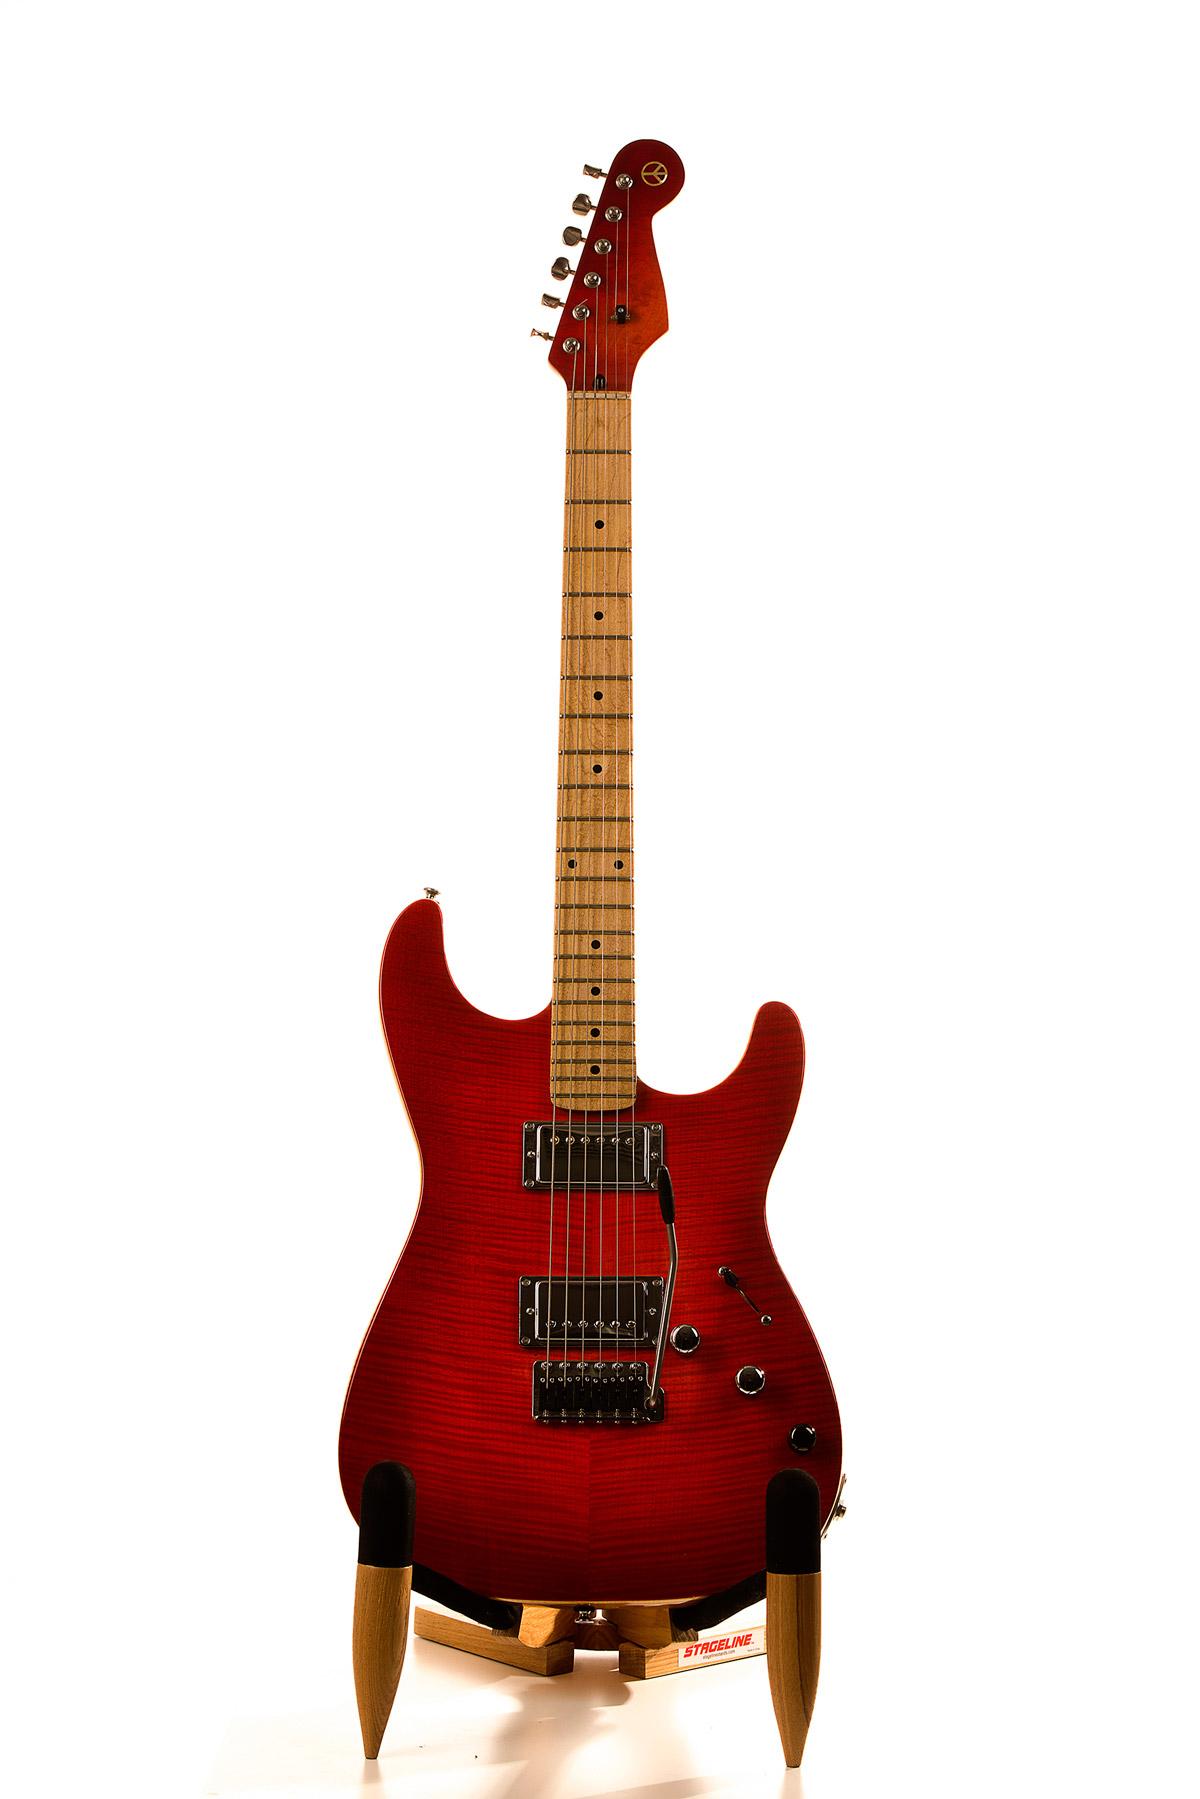 Pusiol_the-tenor guitar